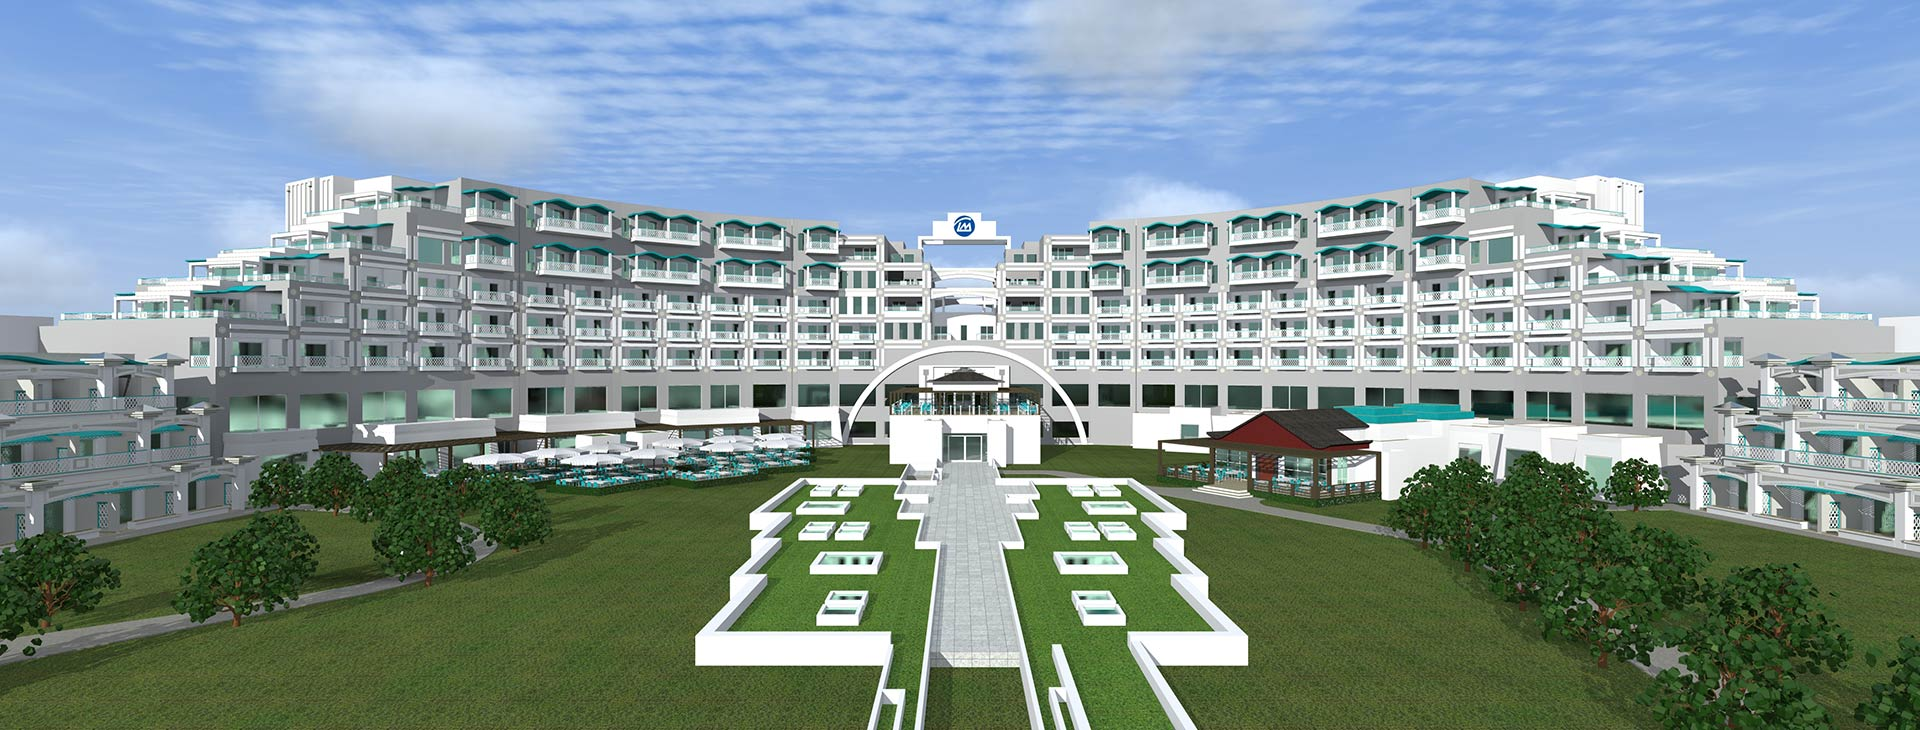 hotel kaya artemis resort & casino